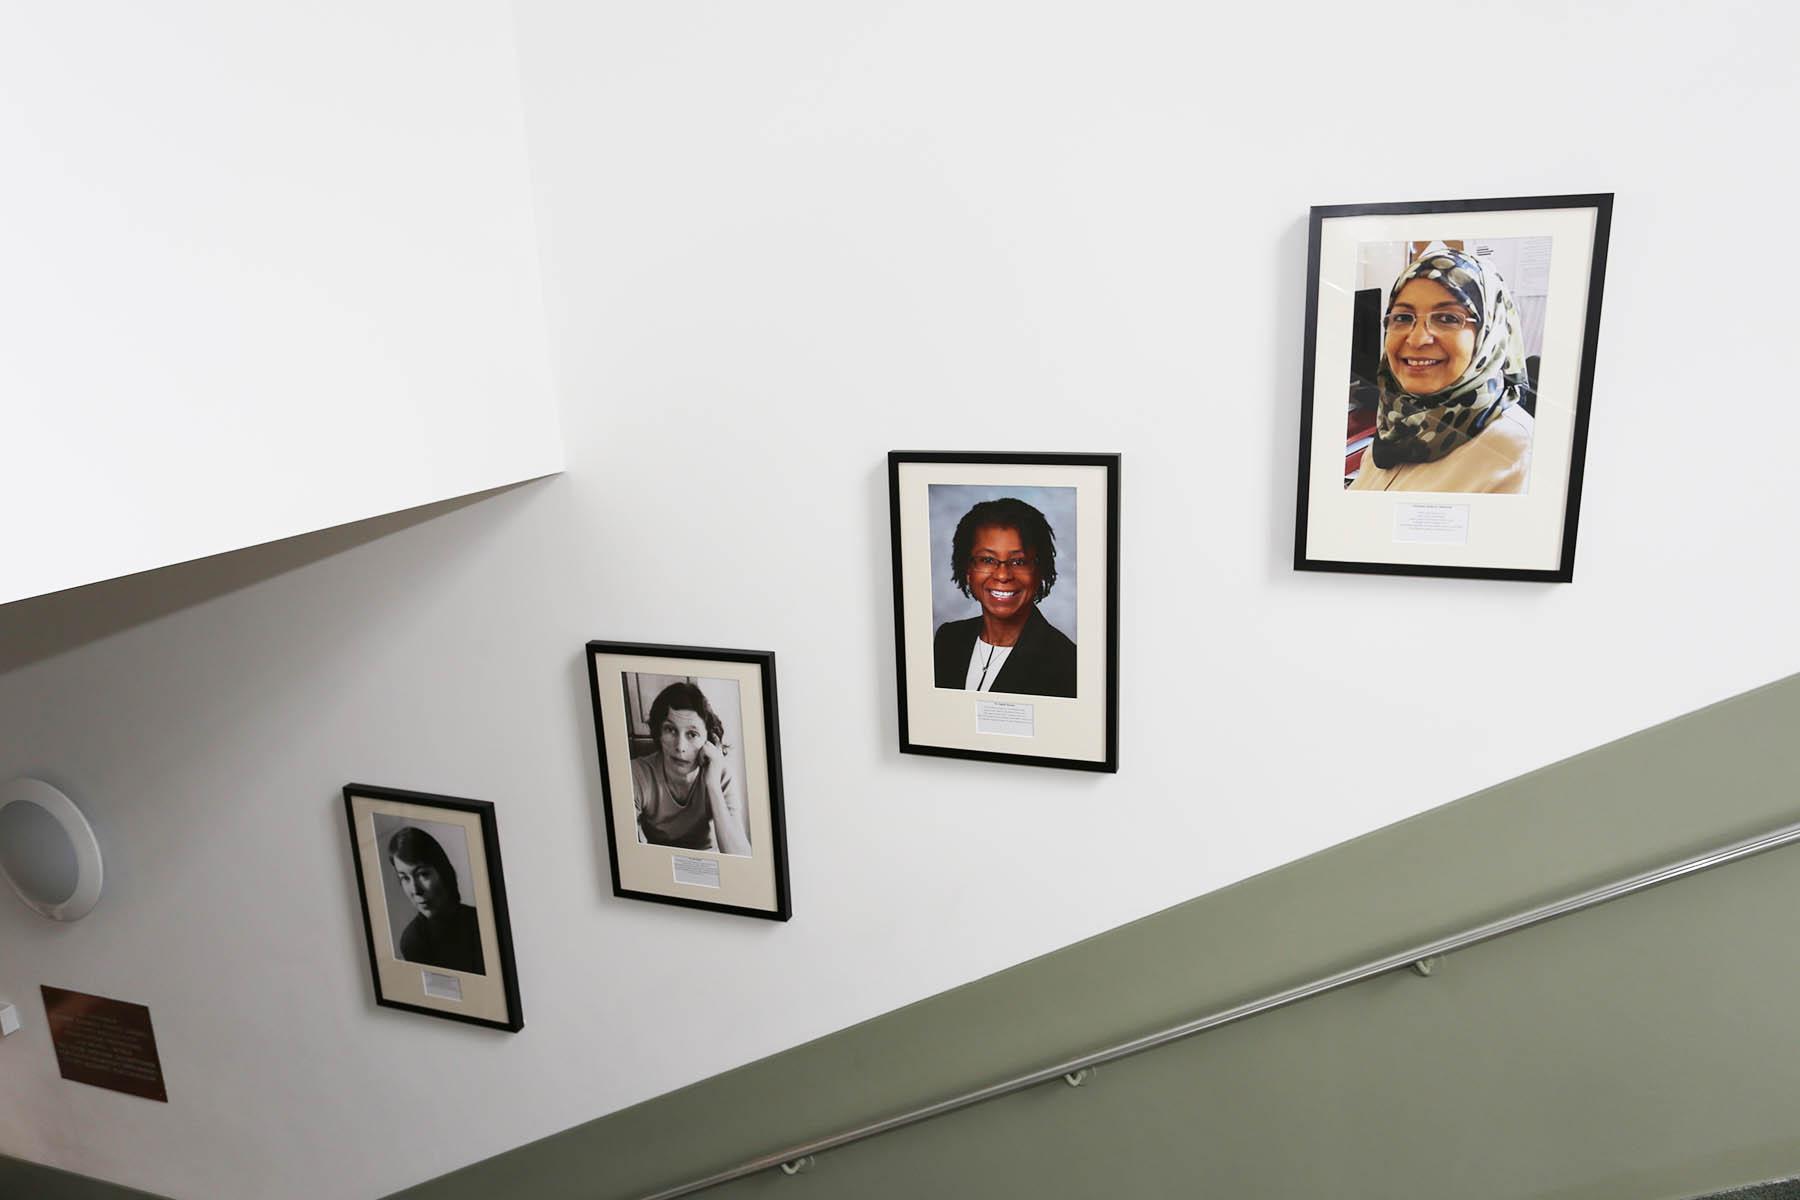 Gillian Morriss-Kay, Ann Taylor, Daphne Bascom and Sulayma Albarwani Sherrington display